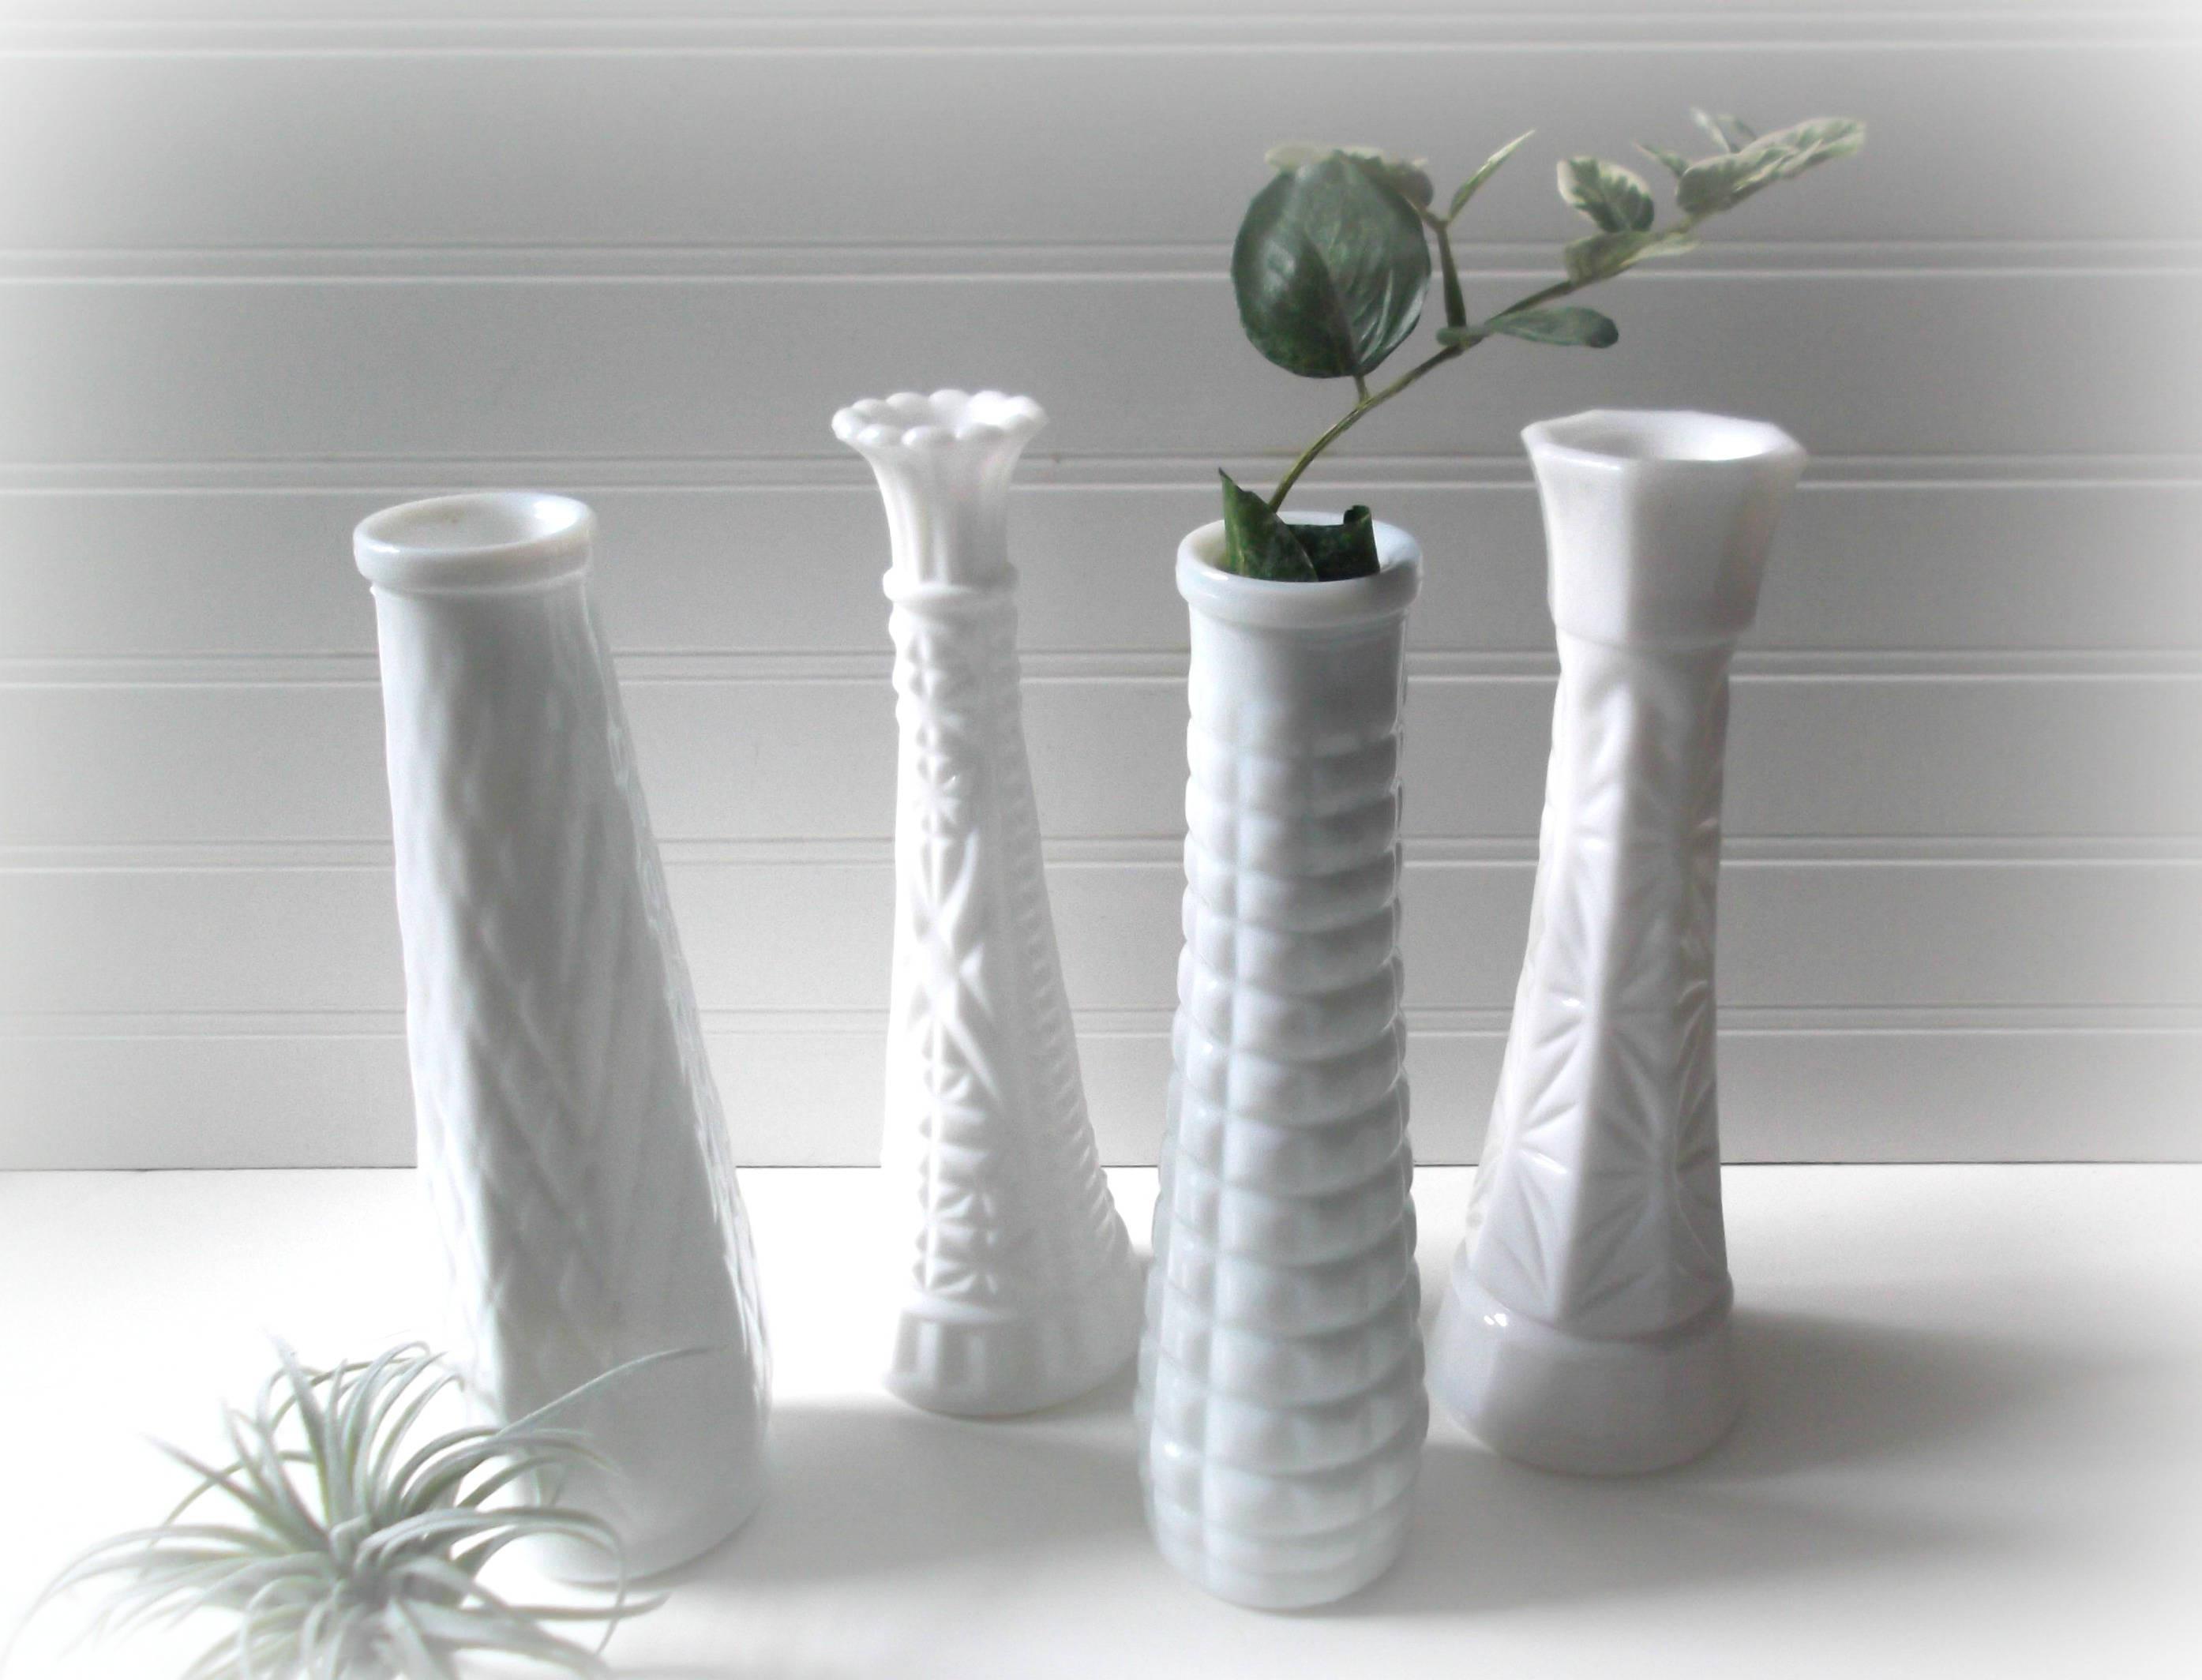 westmoreland milk glass vase of milk glass bud vases set of 4 vases for wedding vintage etsy inside image 0